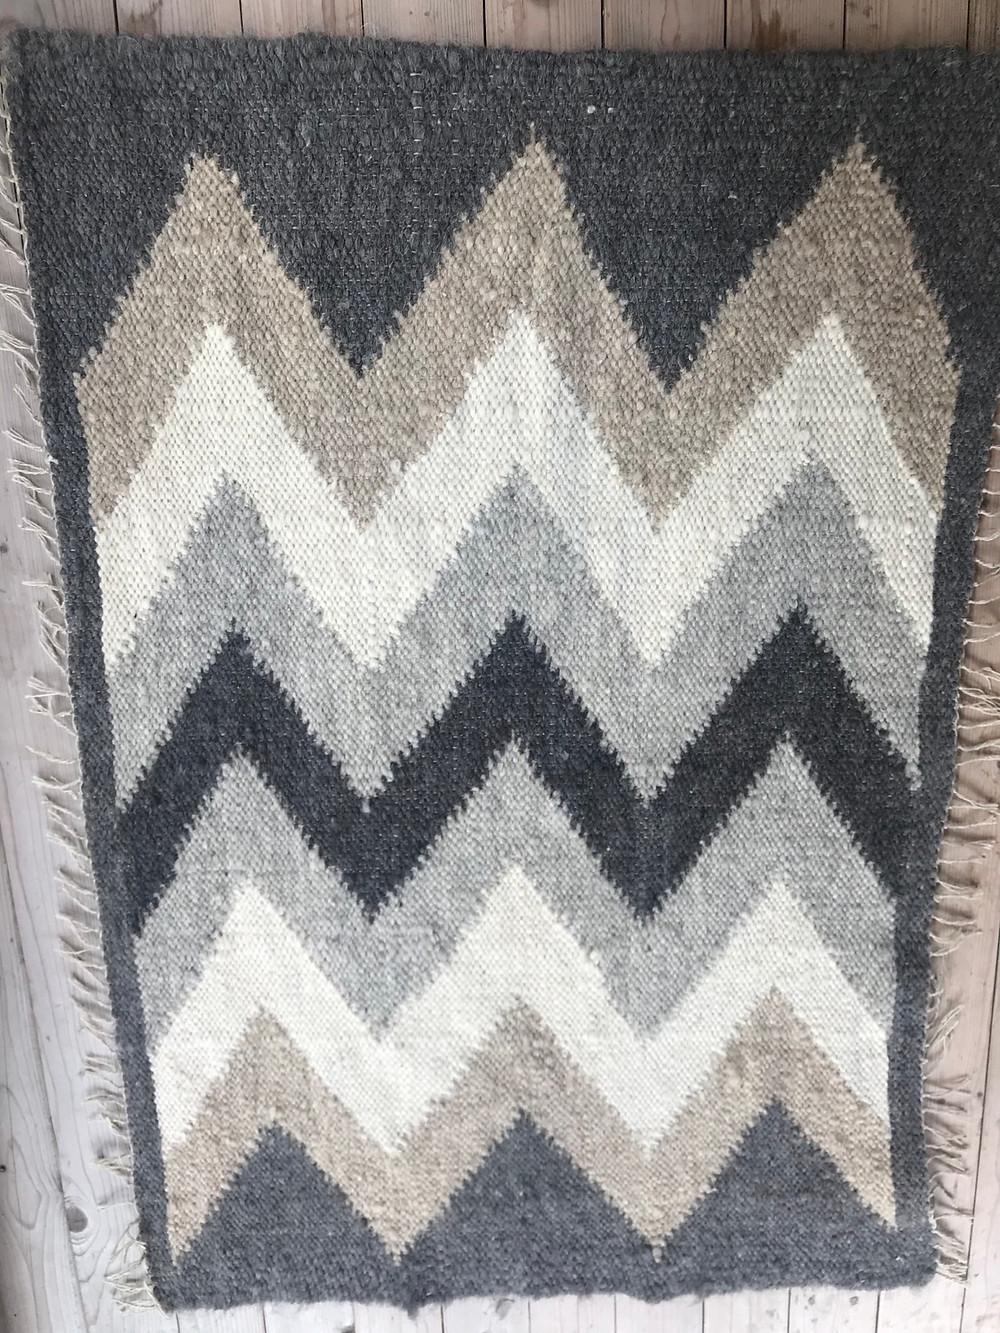 Wool rug called Lizhnyk made by Liz